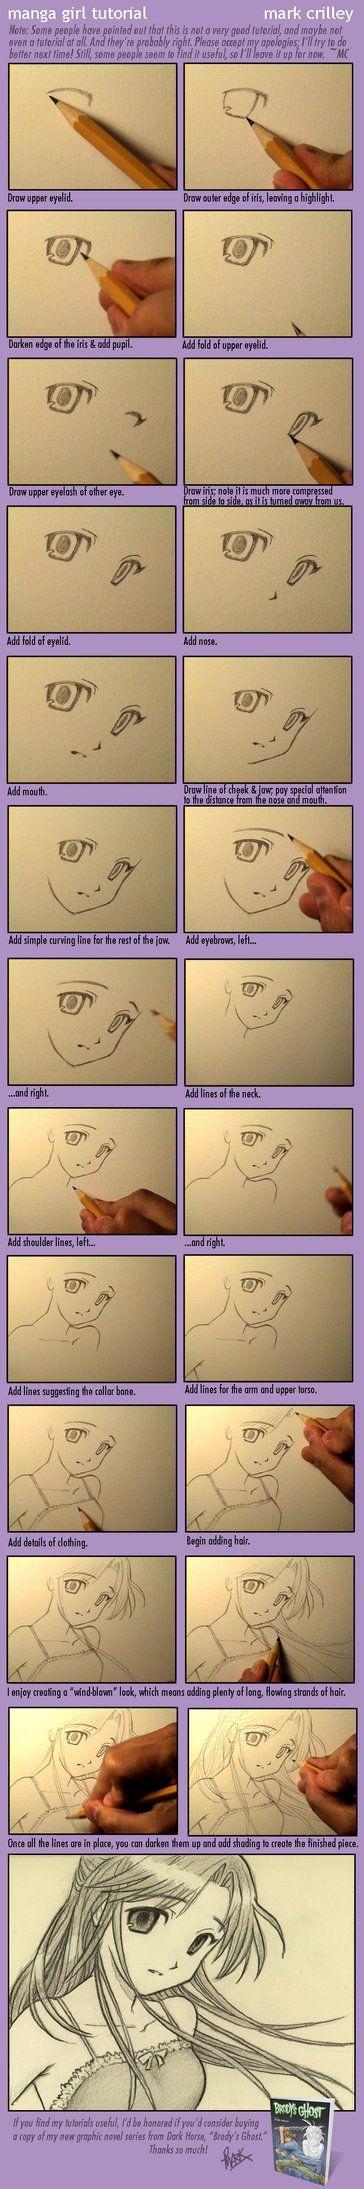 Manga Girl Tutorial